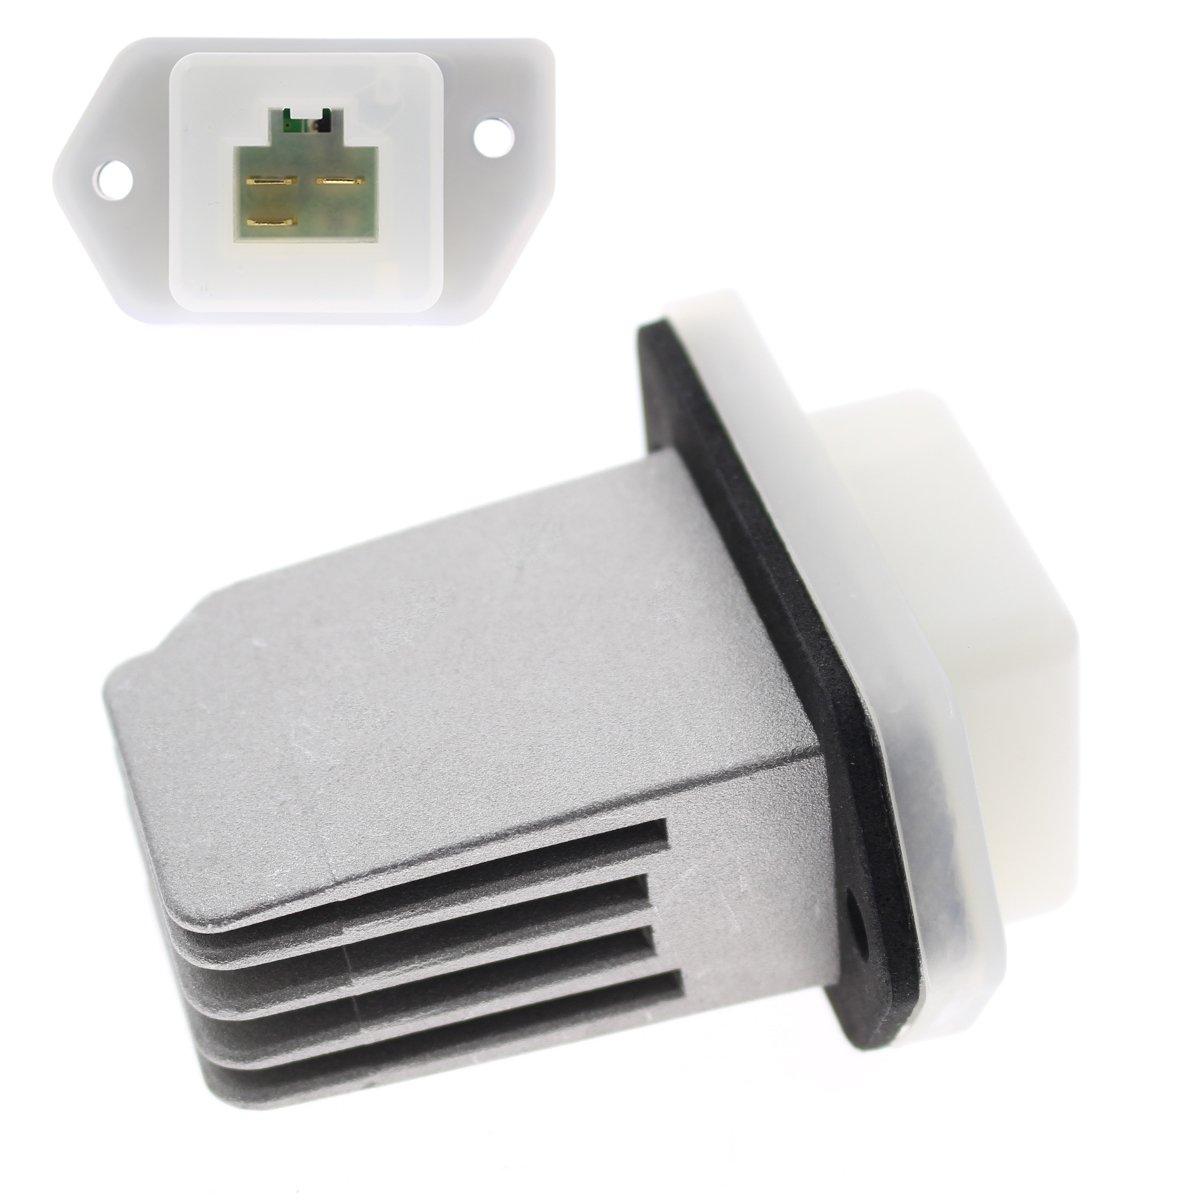 Goodeal Blower Control Amplifier Module Resistor 27761 08 Sentra Motor Wiring Diagram 4ba0a For Nissan Rogue Nv Automotive